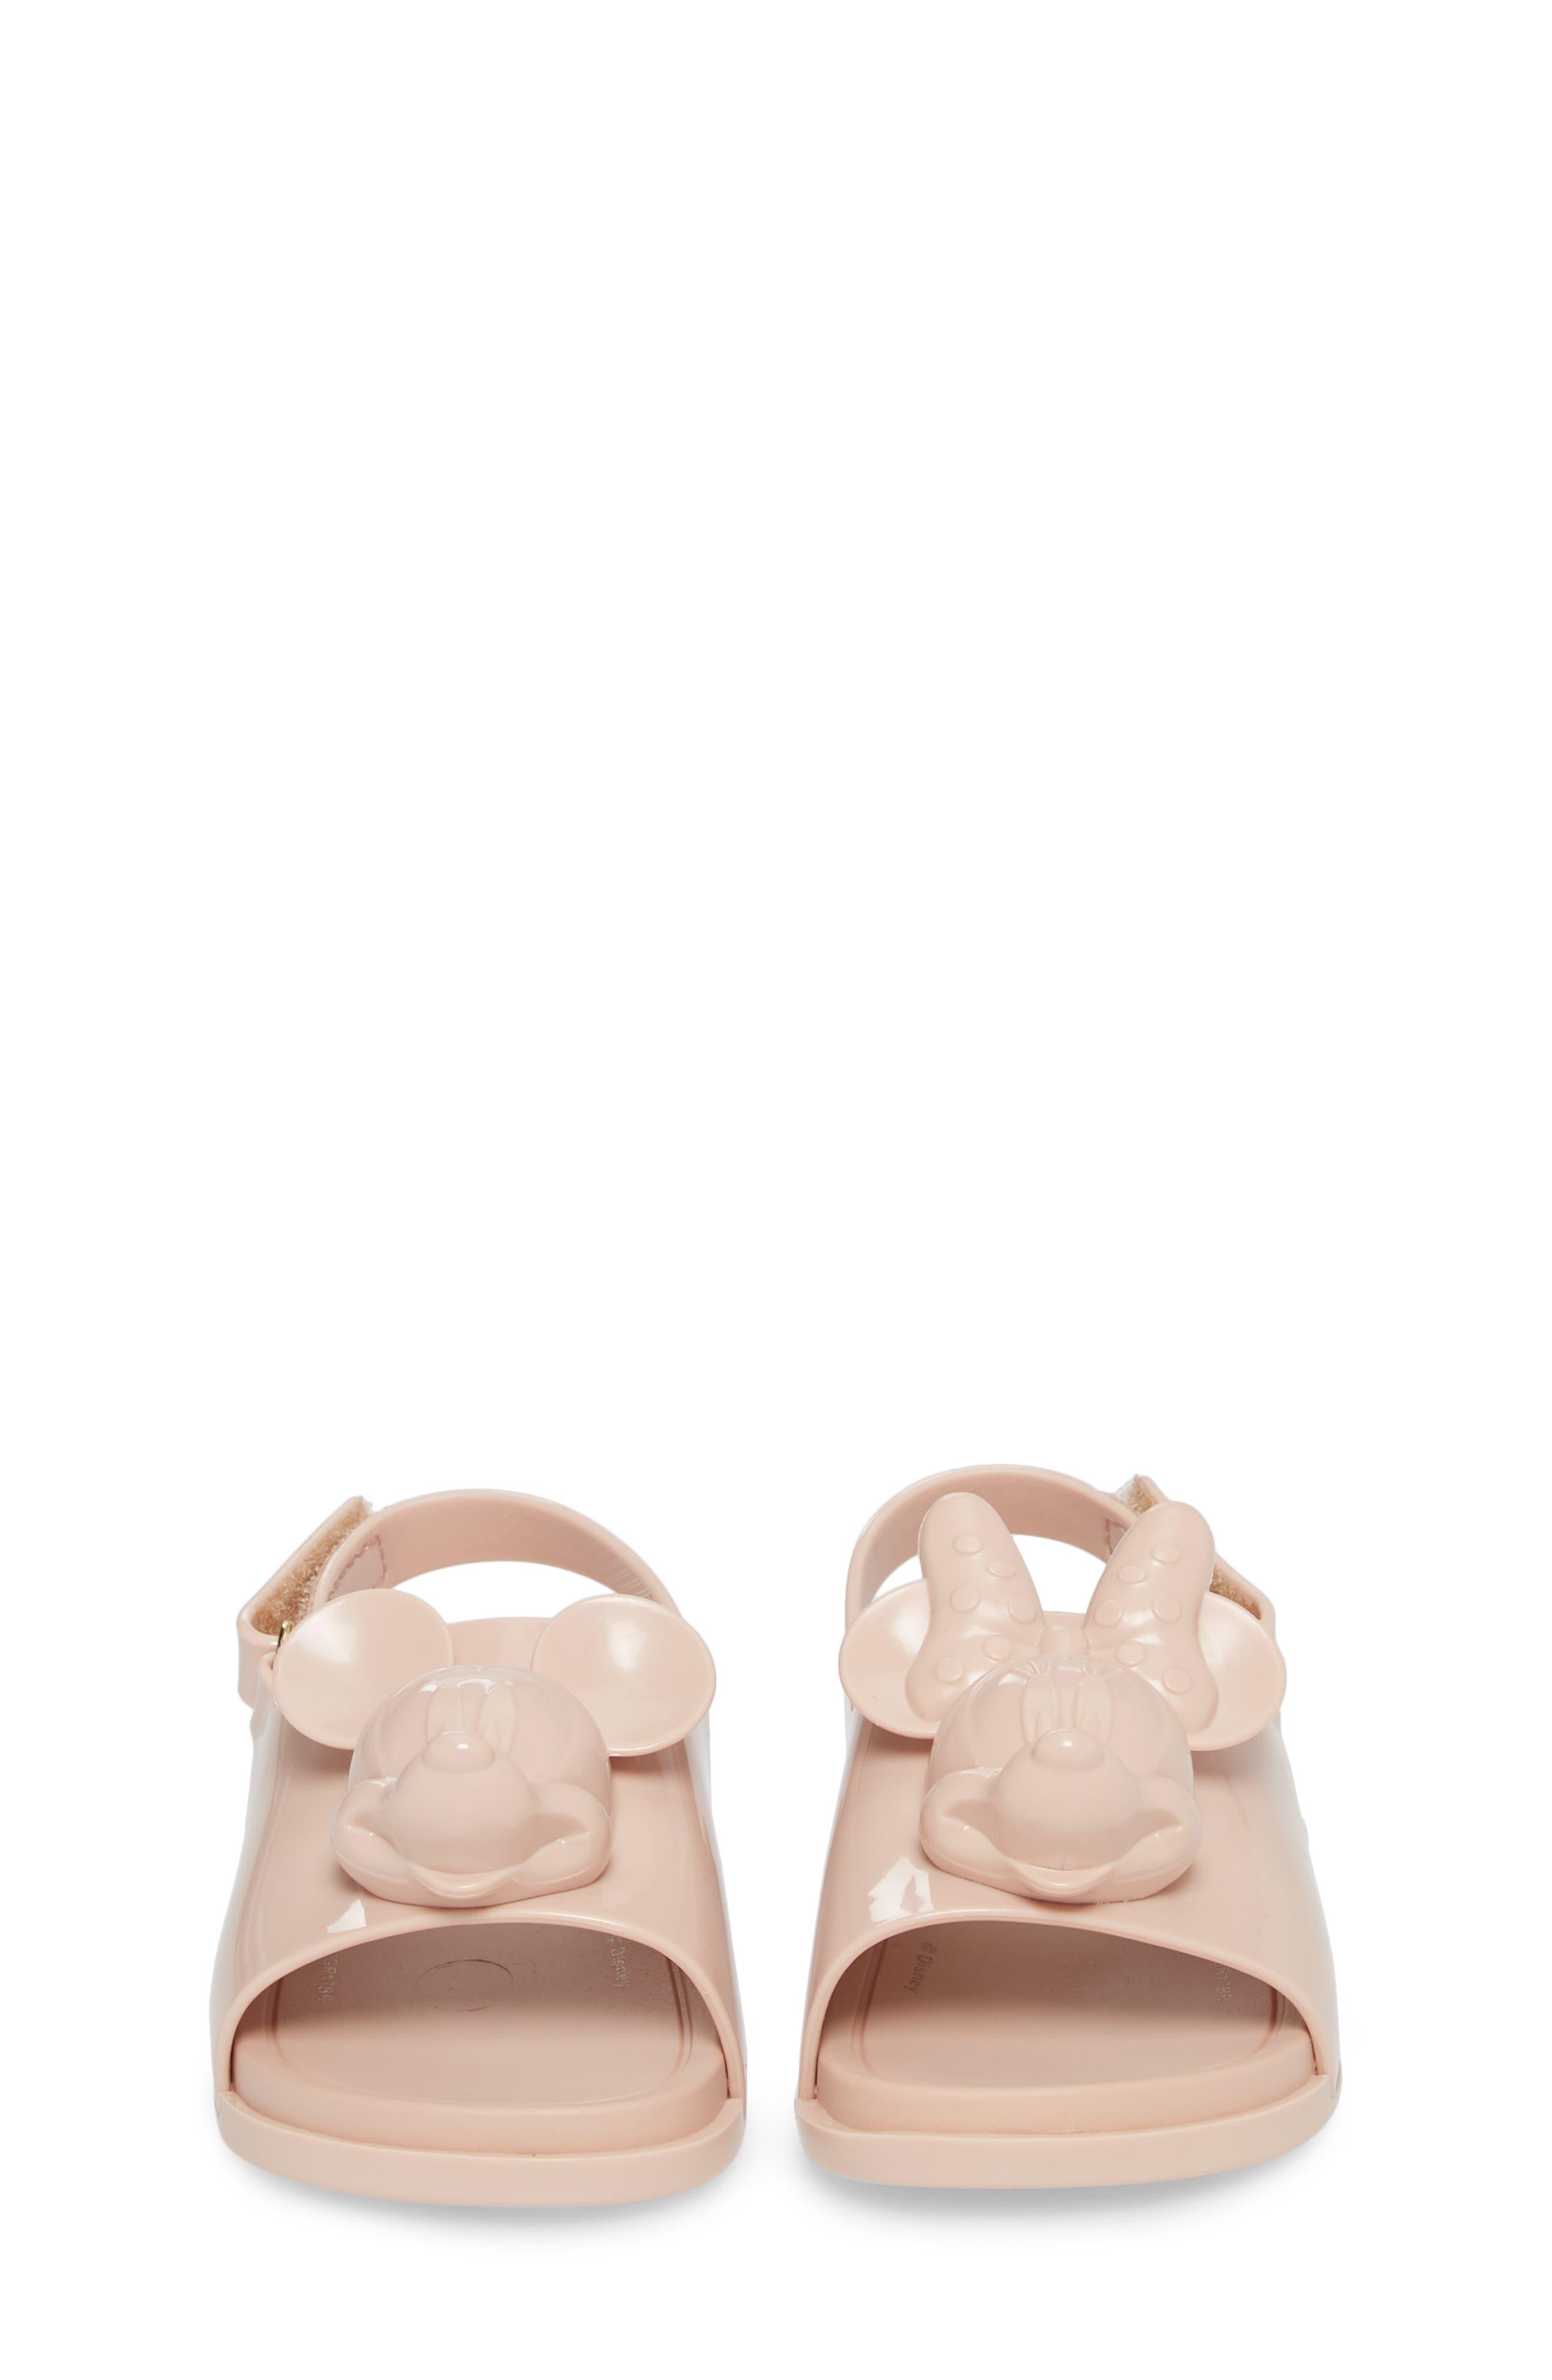 Disney<sup>®</sup> Mini Beach Sandal,                             Alternate thumbnail 16, color,